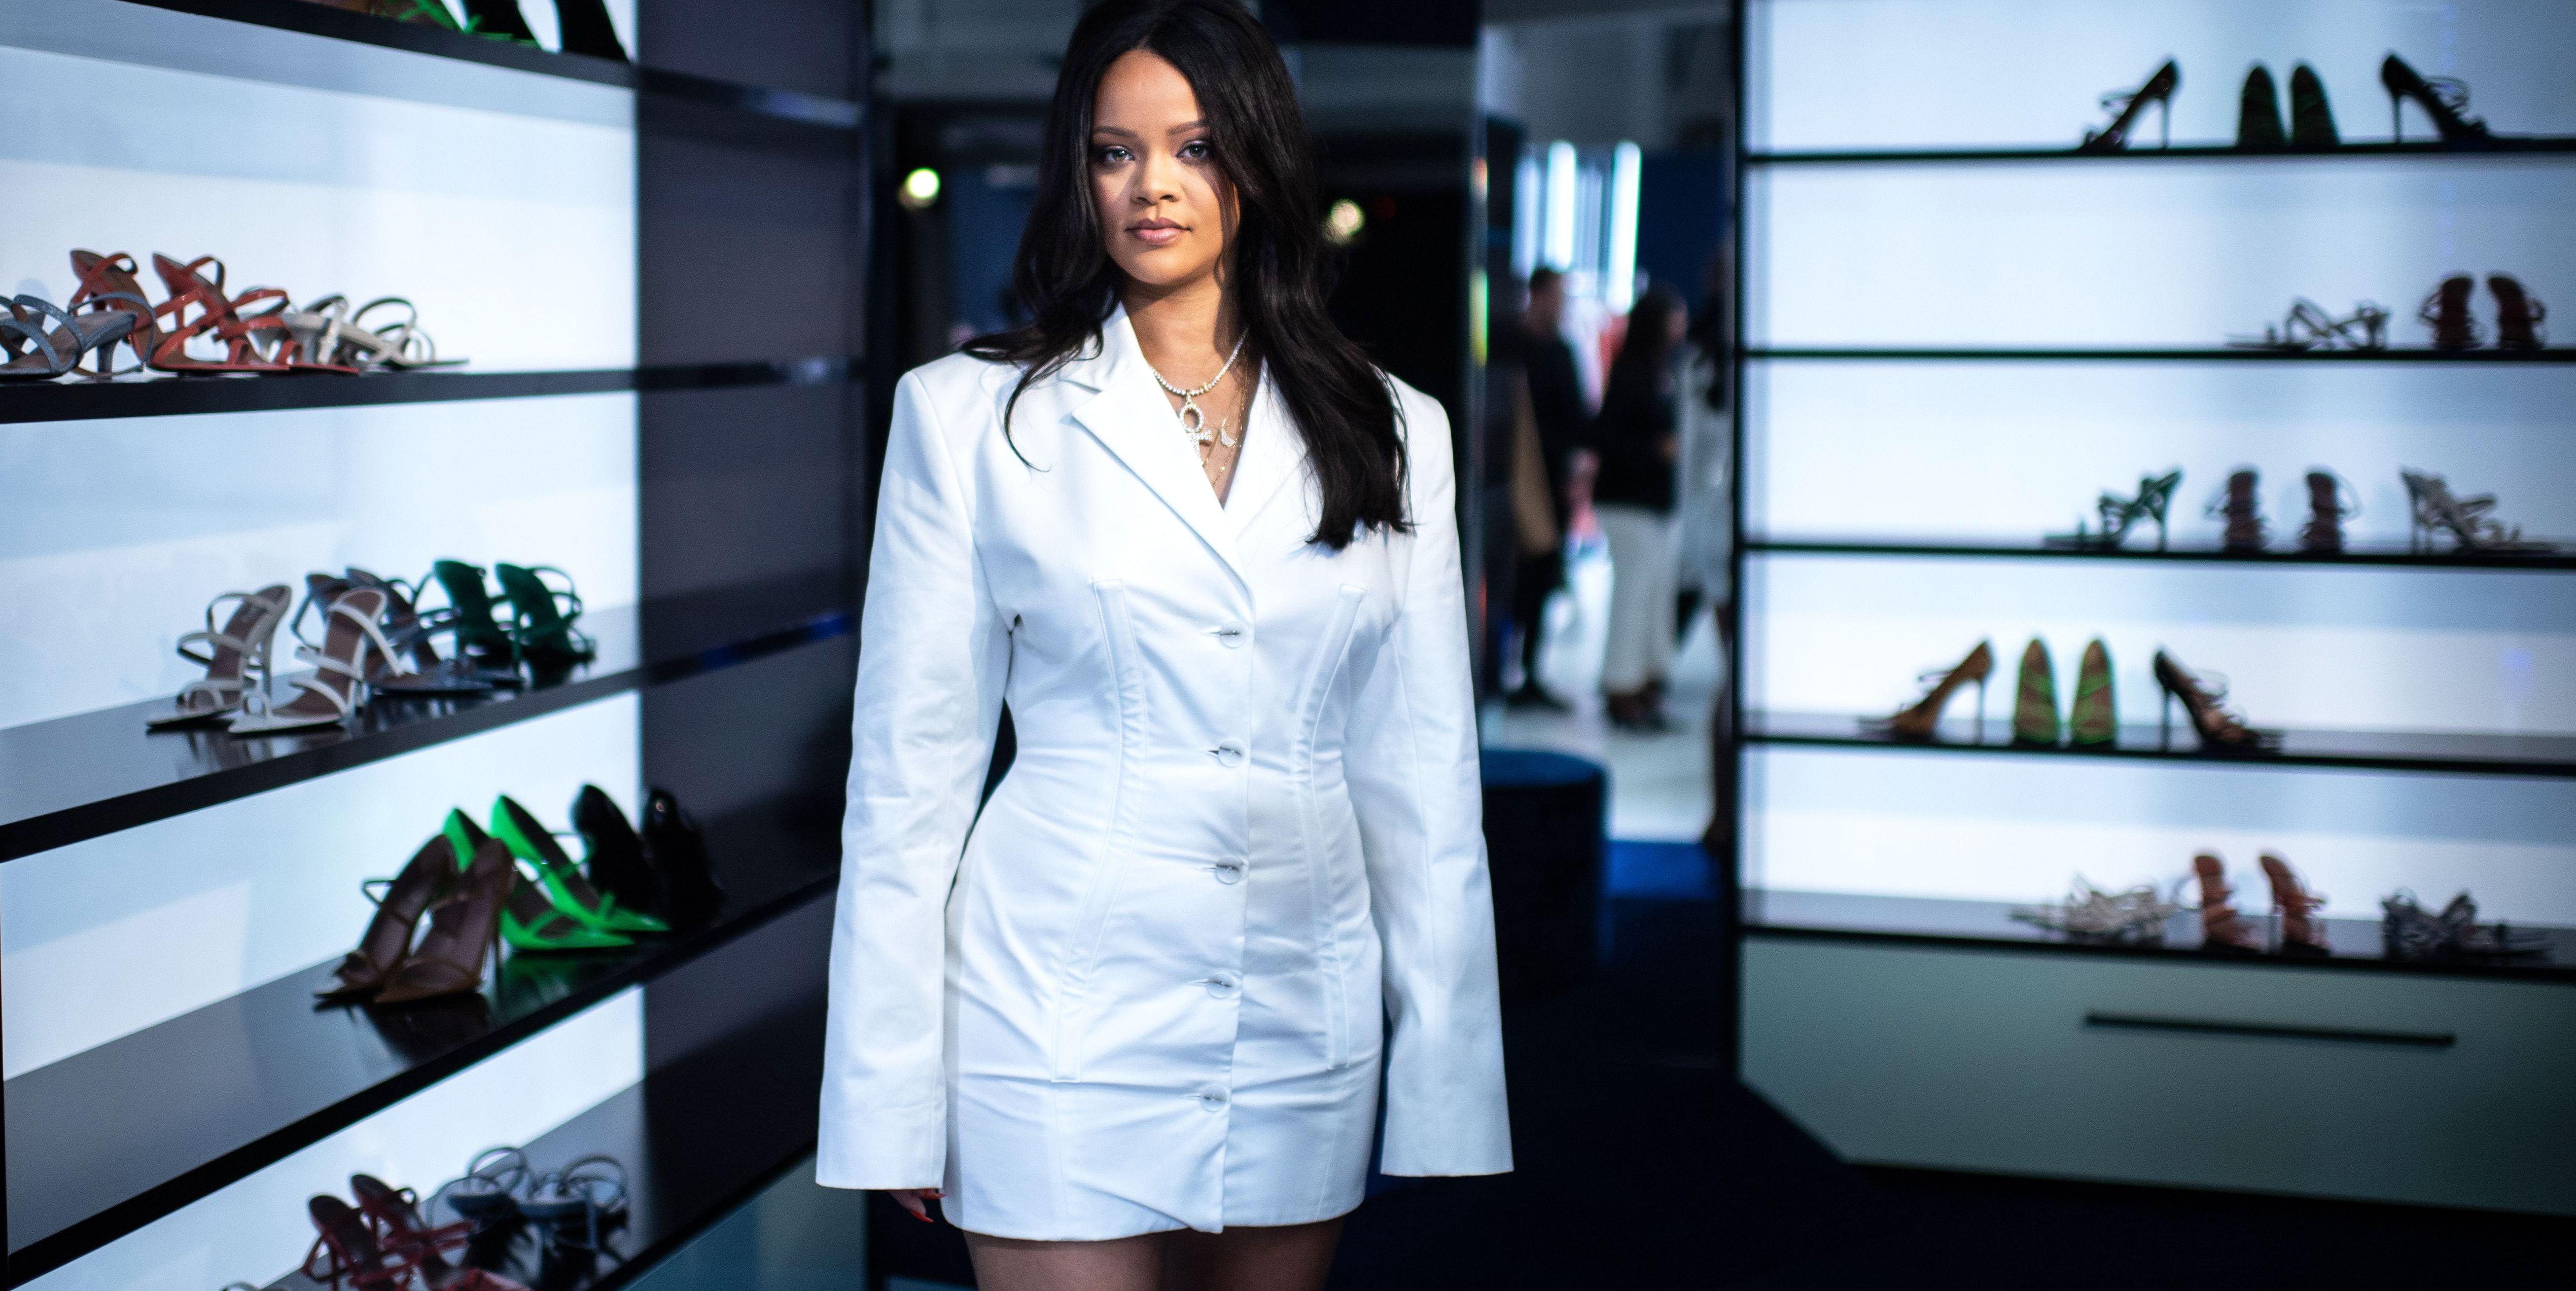 Rihanna Wore Her Own Fenty Blazer Mini Dress to Launch Her New Fashion Line